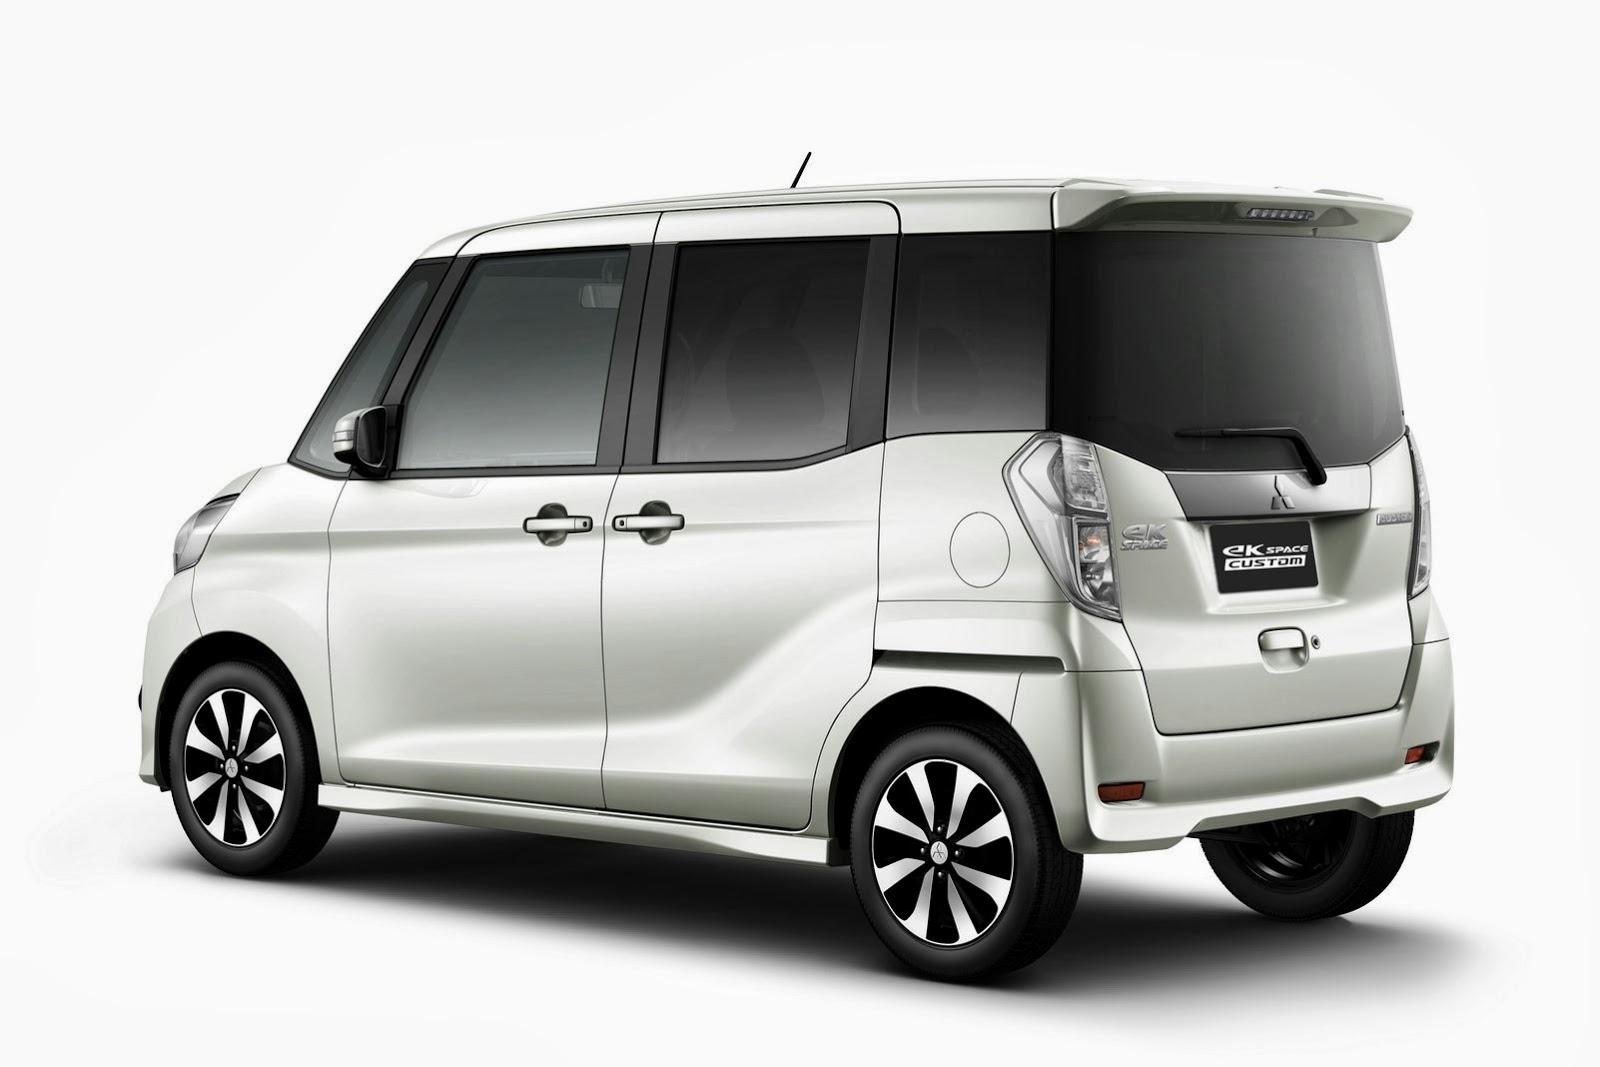 2014 Mitsubishi Ek Space Custom It S Cool To Be Square